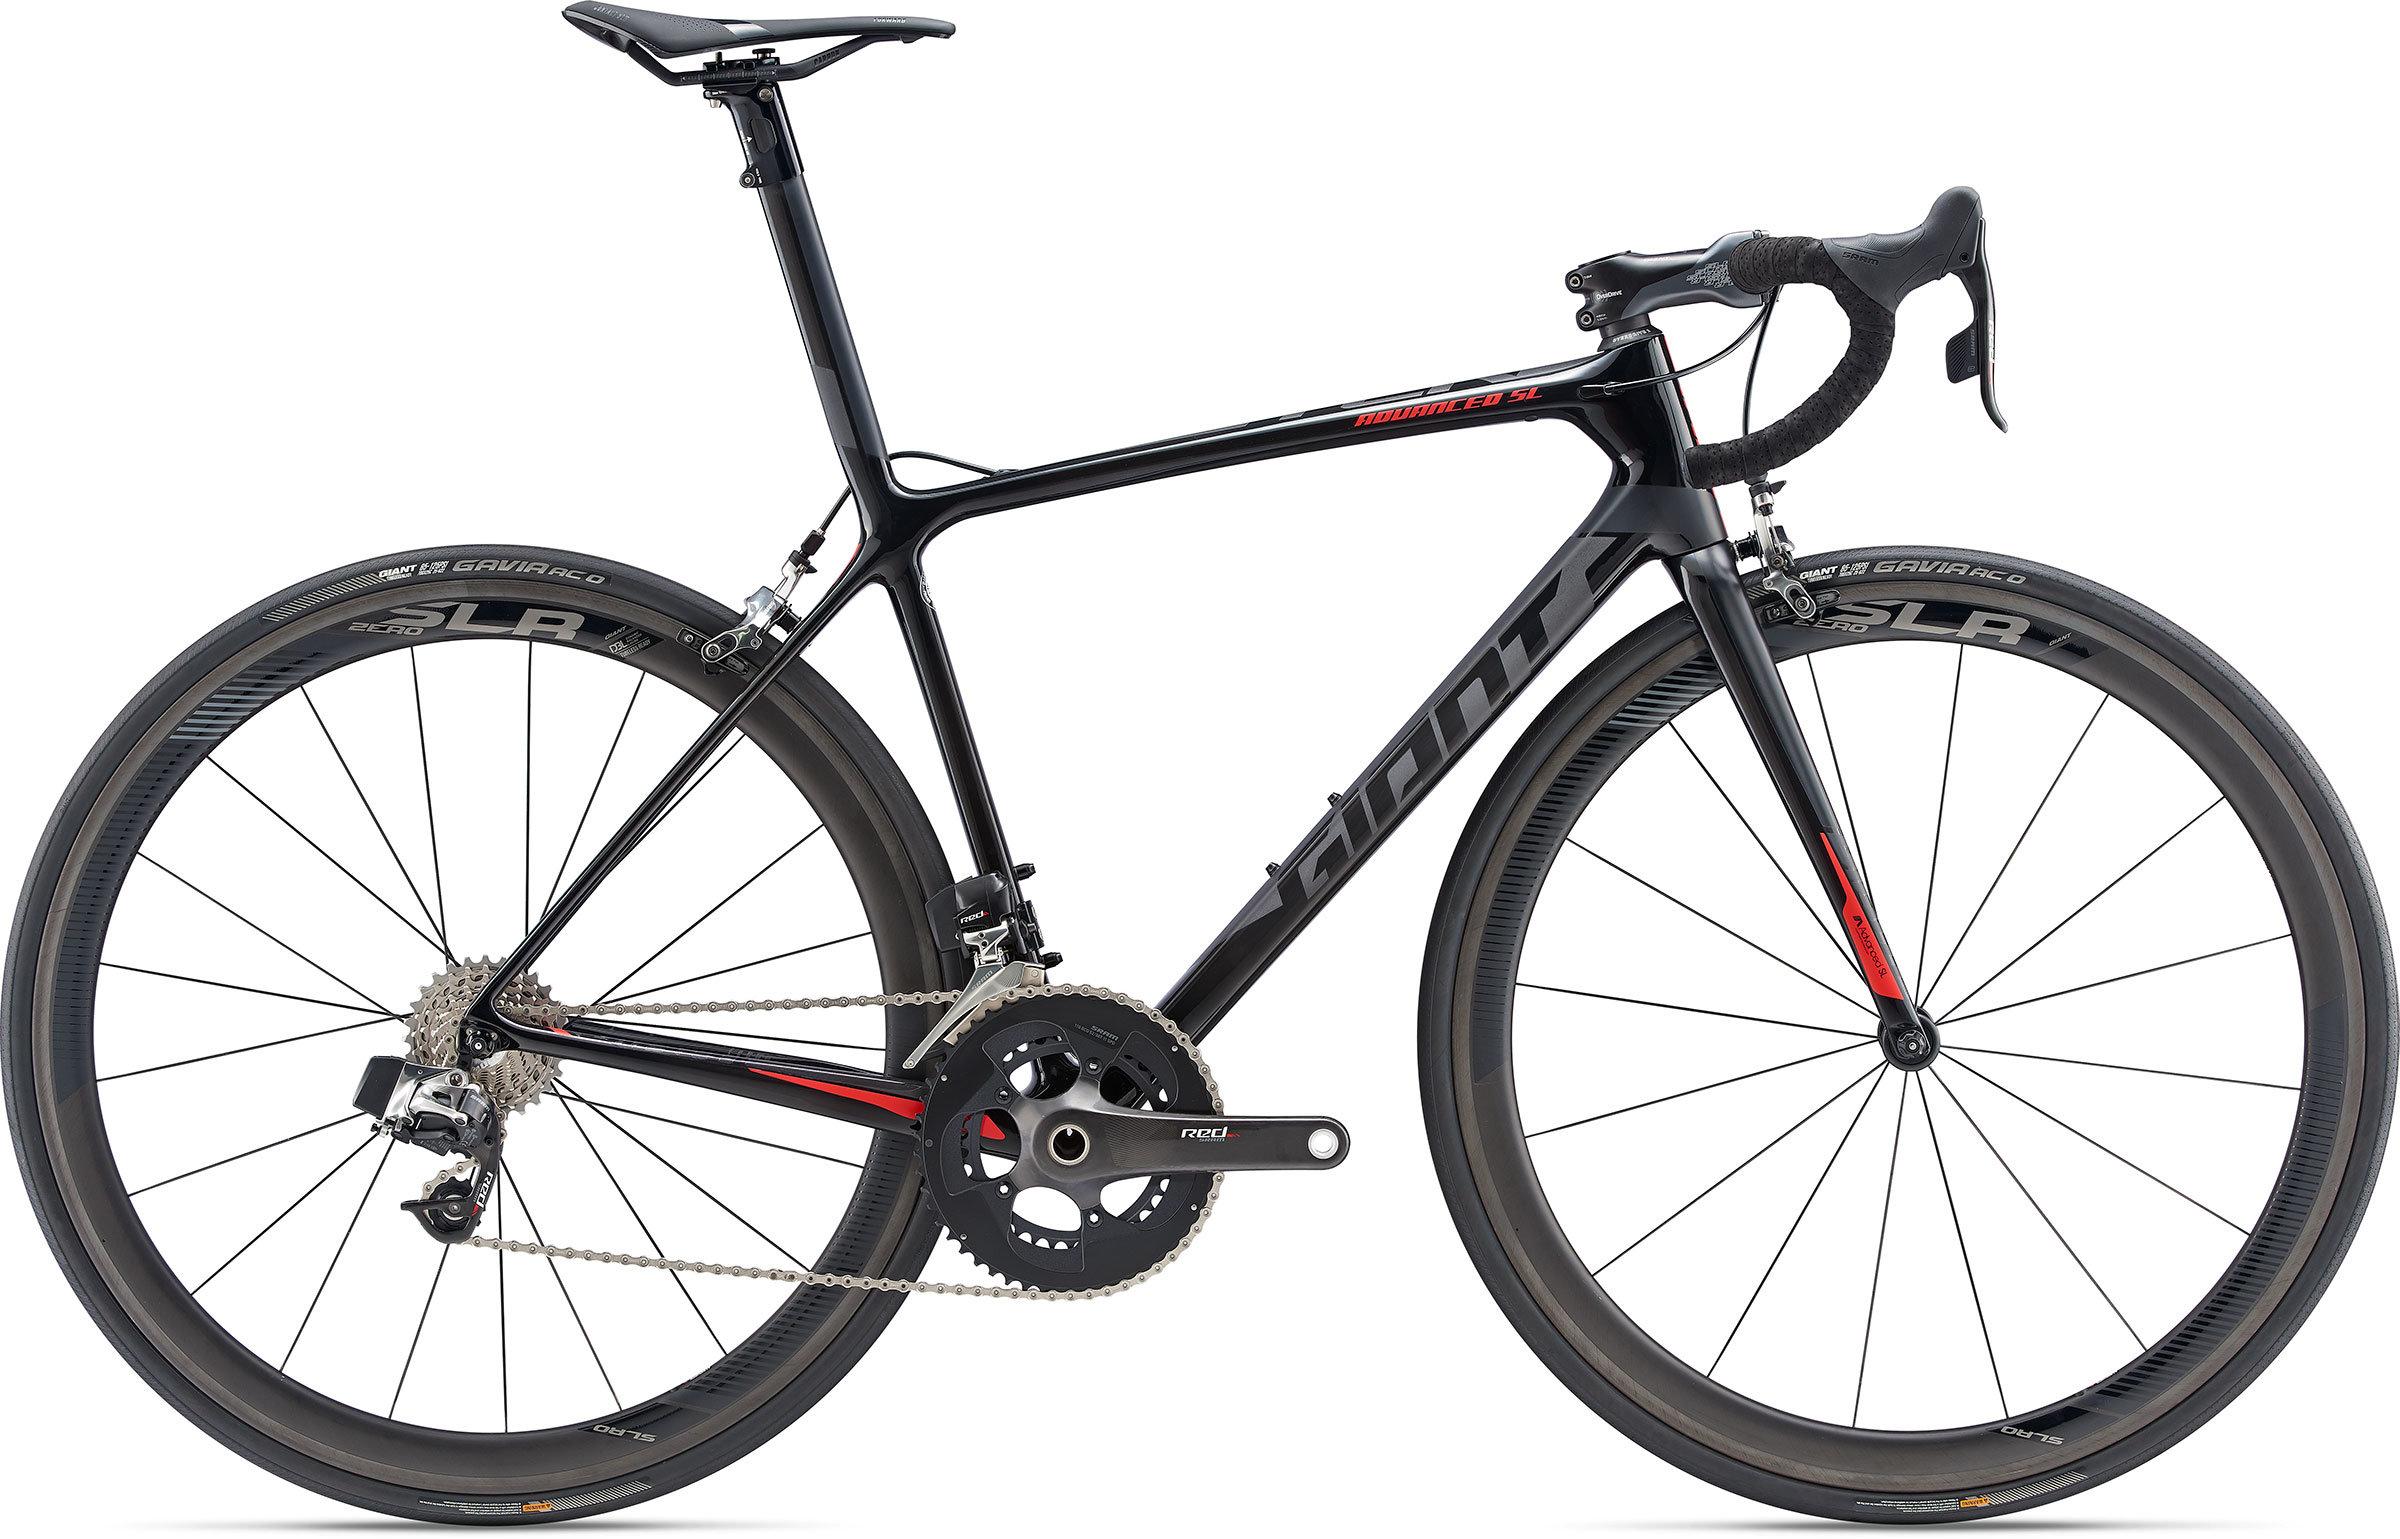 e10bd9acc49 Giant TCR Advanced SL 0 RED - Wheel World Bike Shops - Road Bikes ...